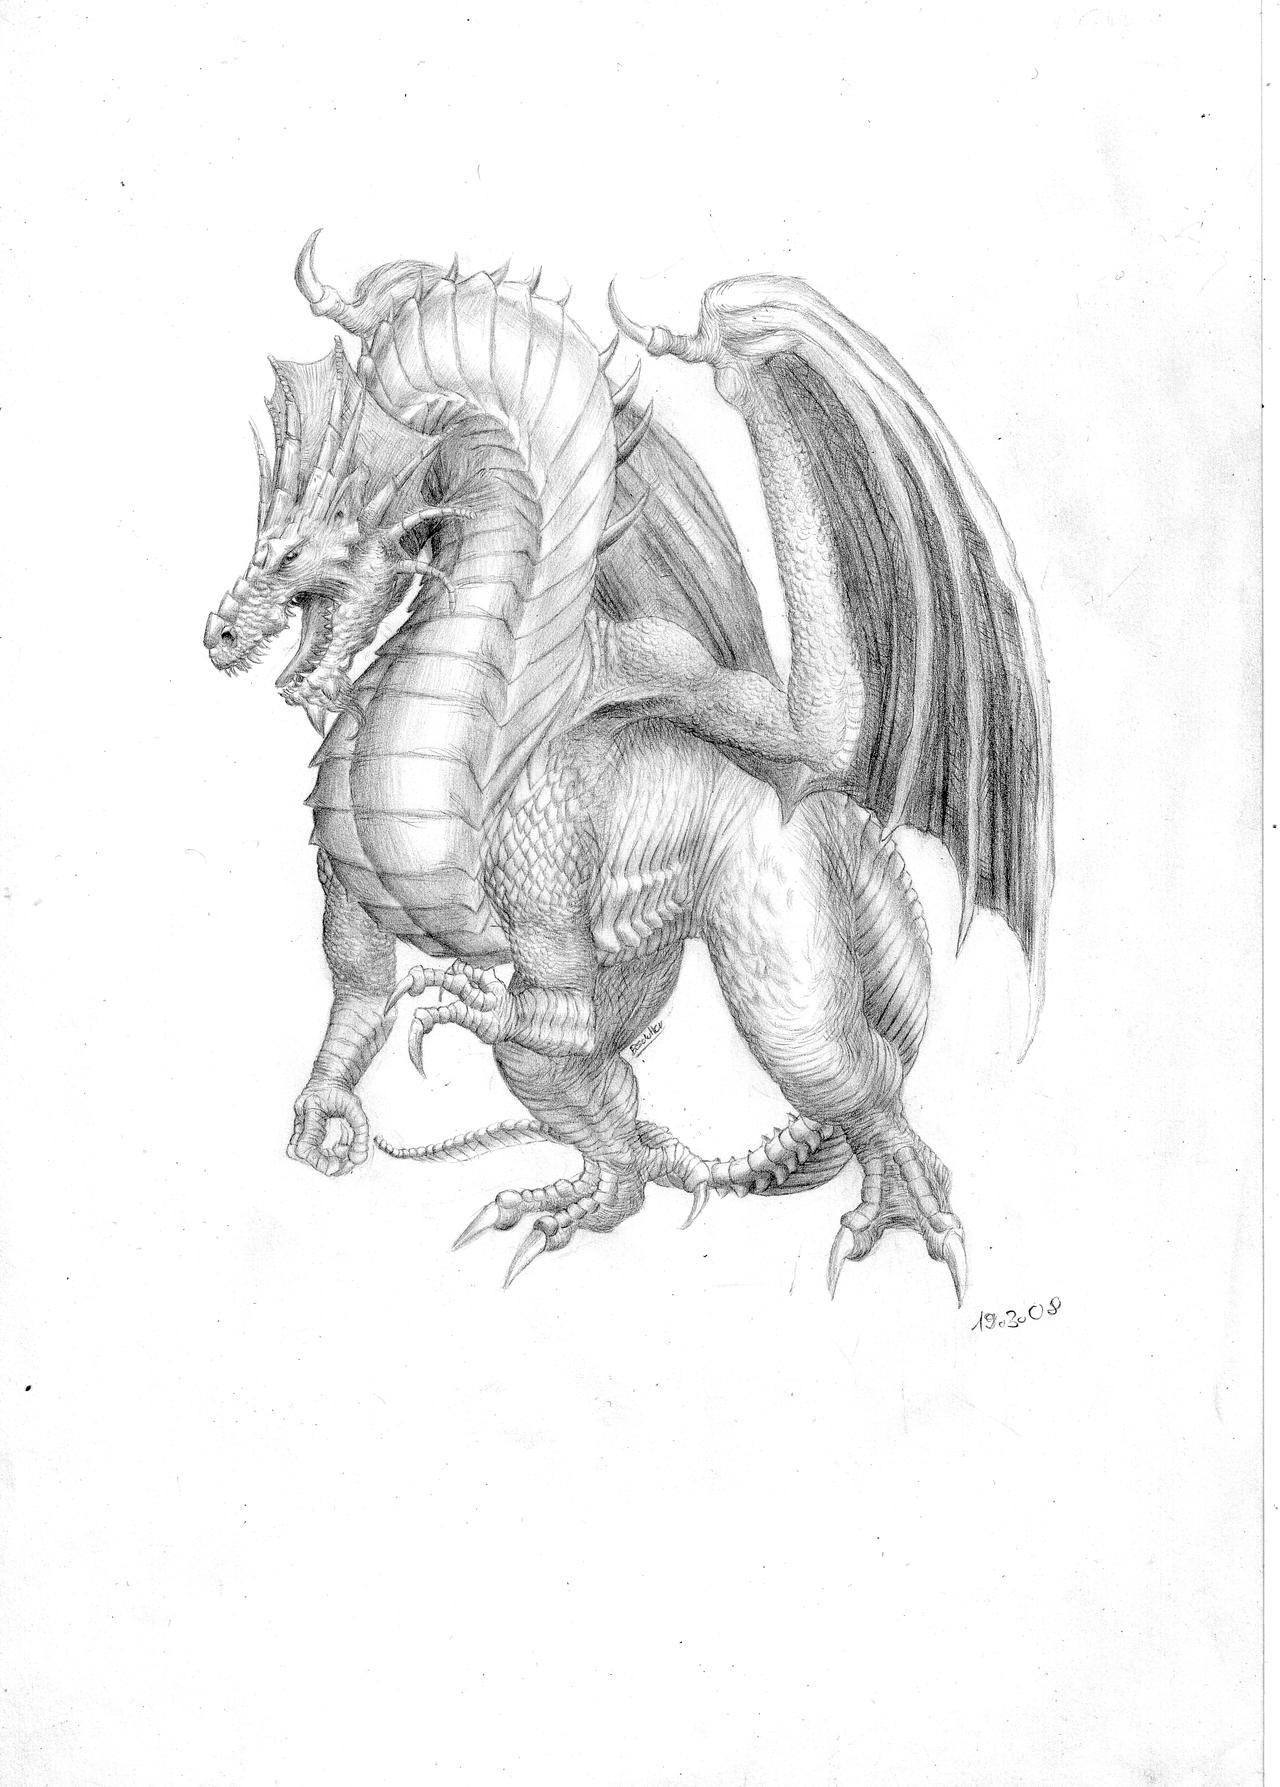 tabur the dragon of fury by SolidSake